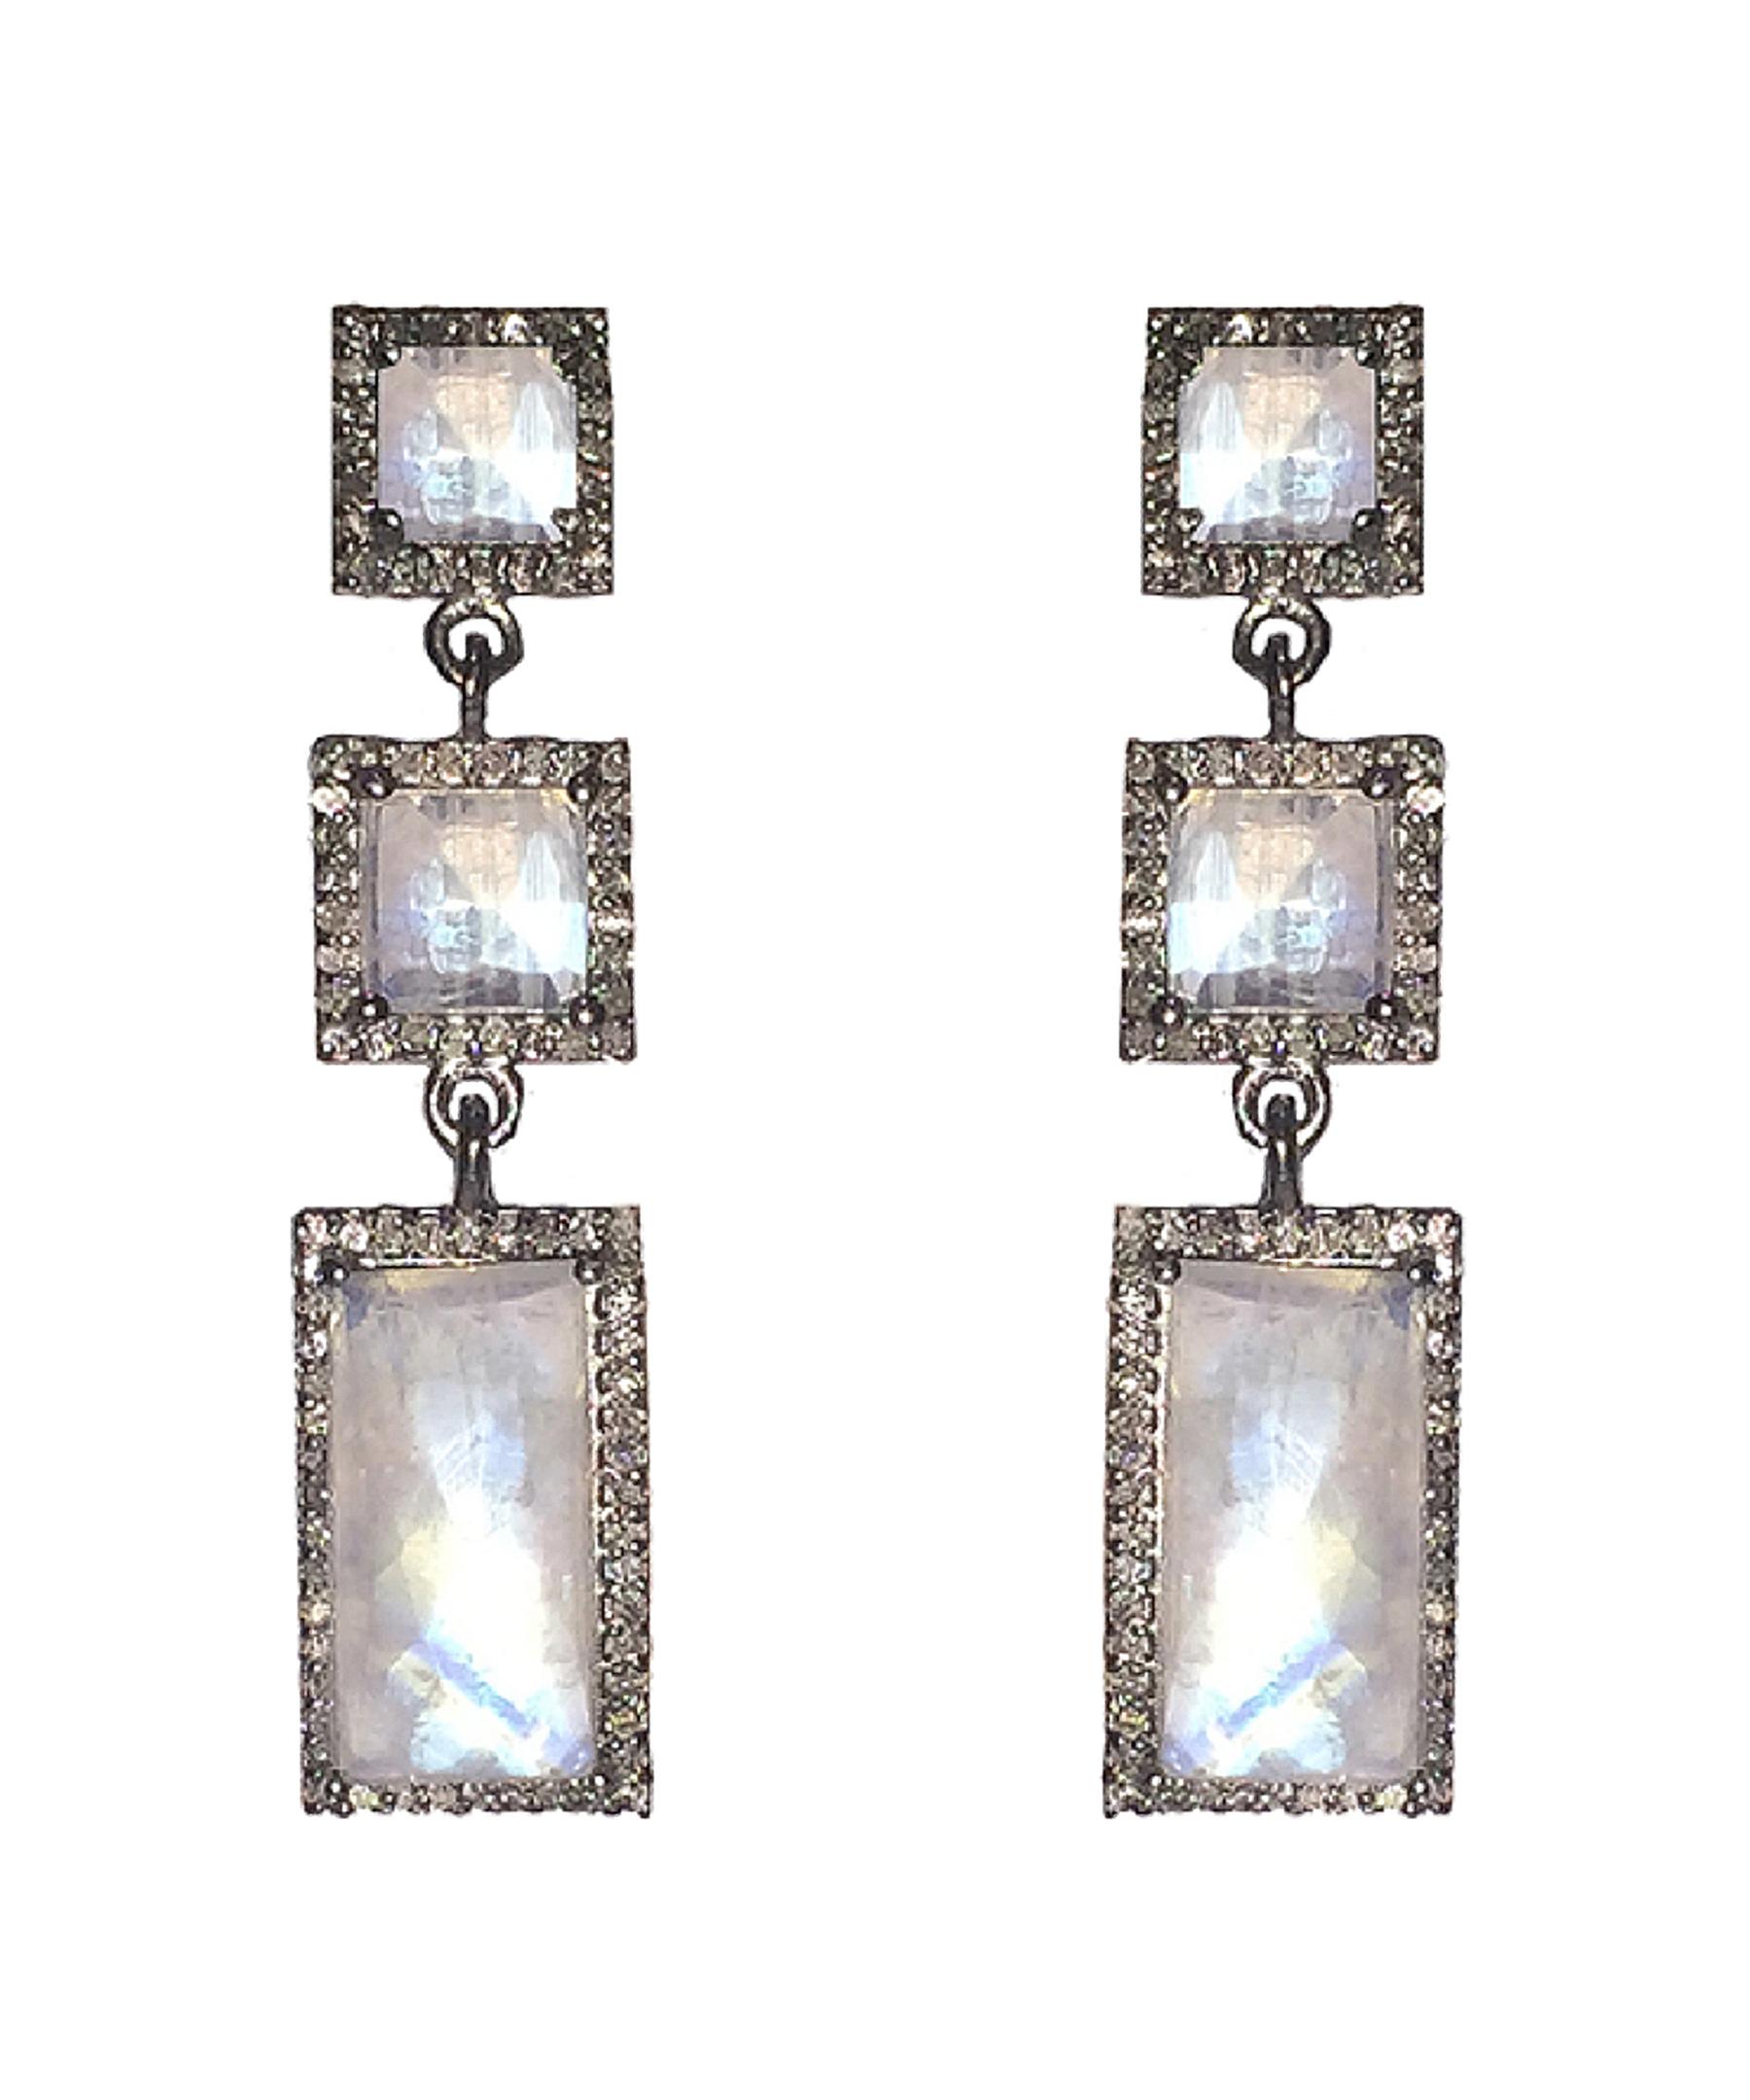 adornia moonstone and champagne diamond thompson earrings. Black Bedroom Furniture Sets. Home Design Ideas